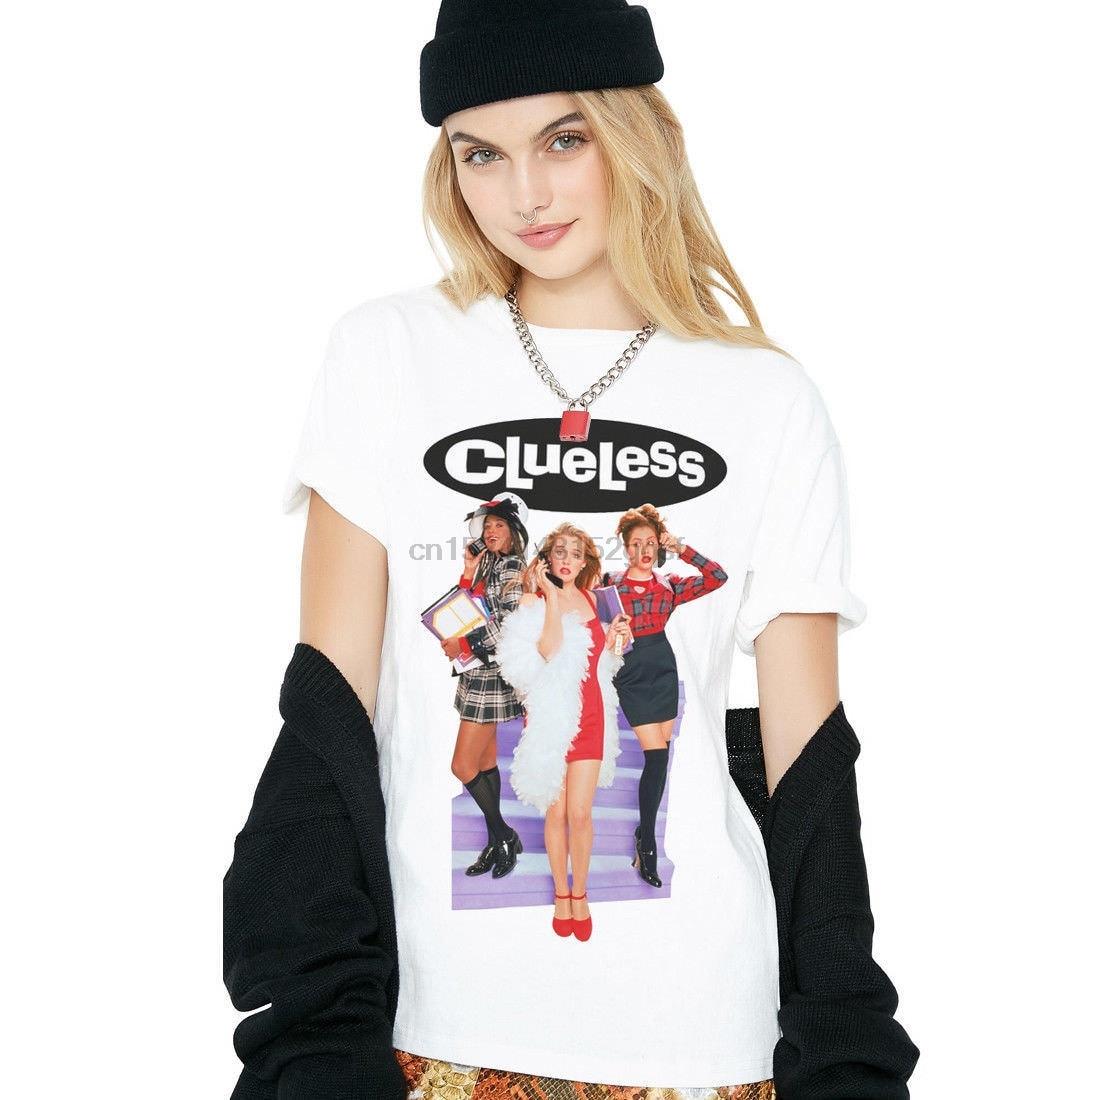 Checkered Clueless Cher Women's 90s Movie Alicia Silverstone Wear